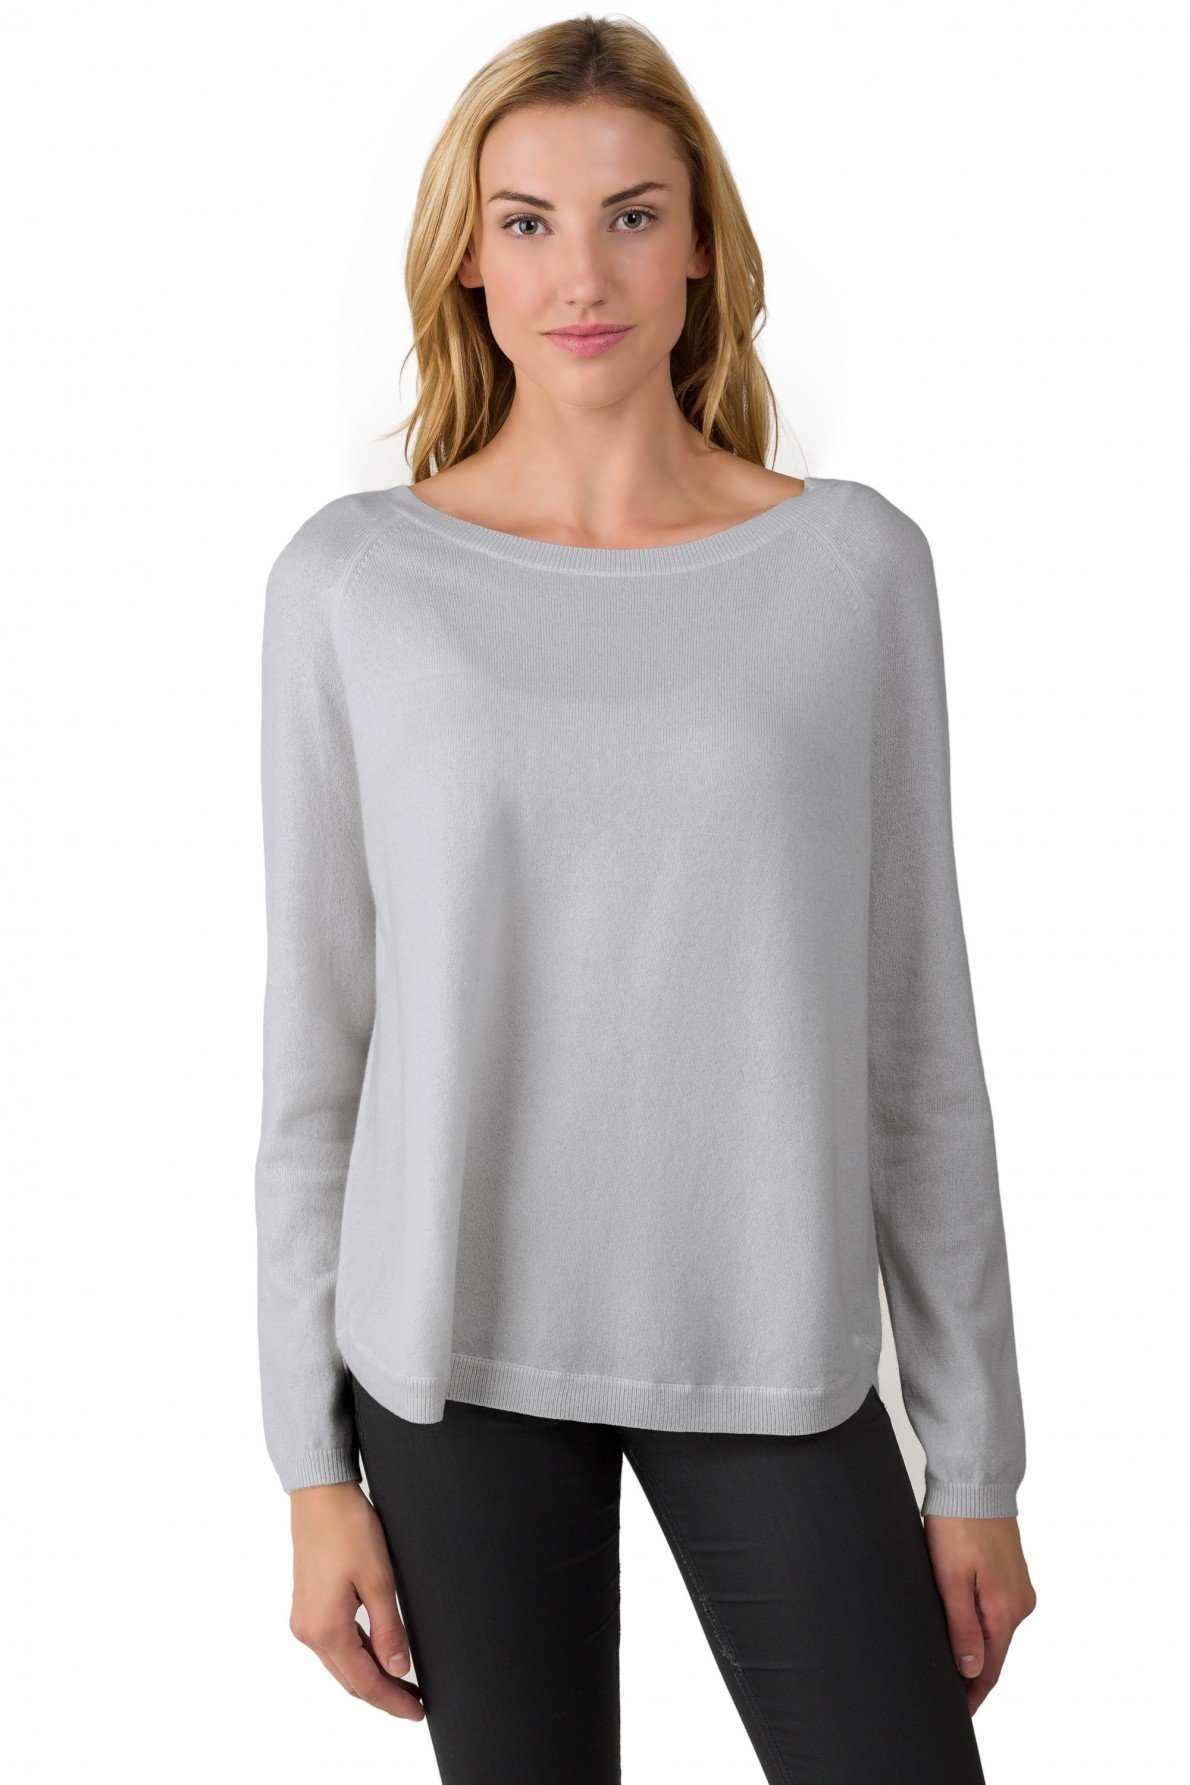 J CASHMERE Women's 100% Cashmere Slouchy Raglan Sleeve Boatneck Sweater (L, Grey)